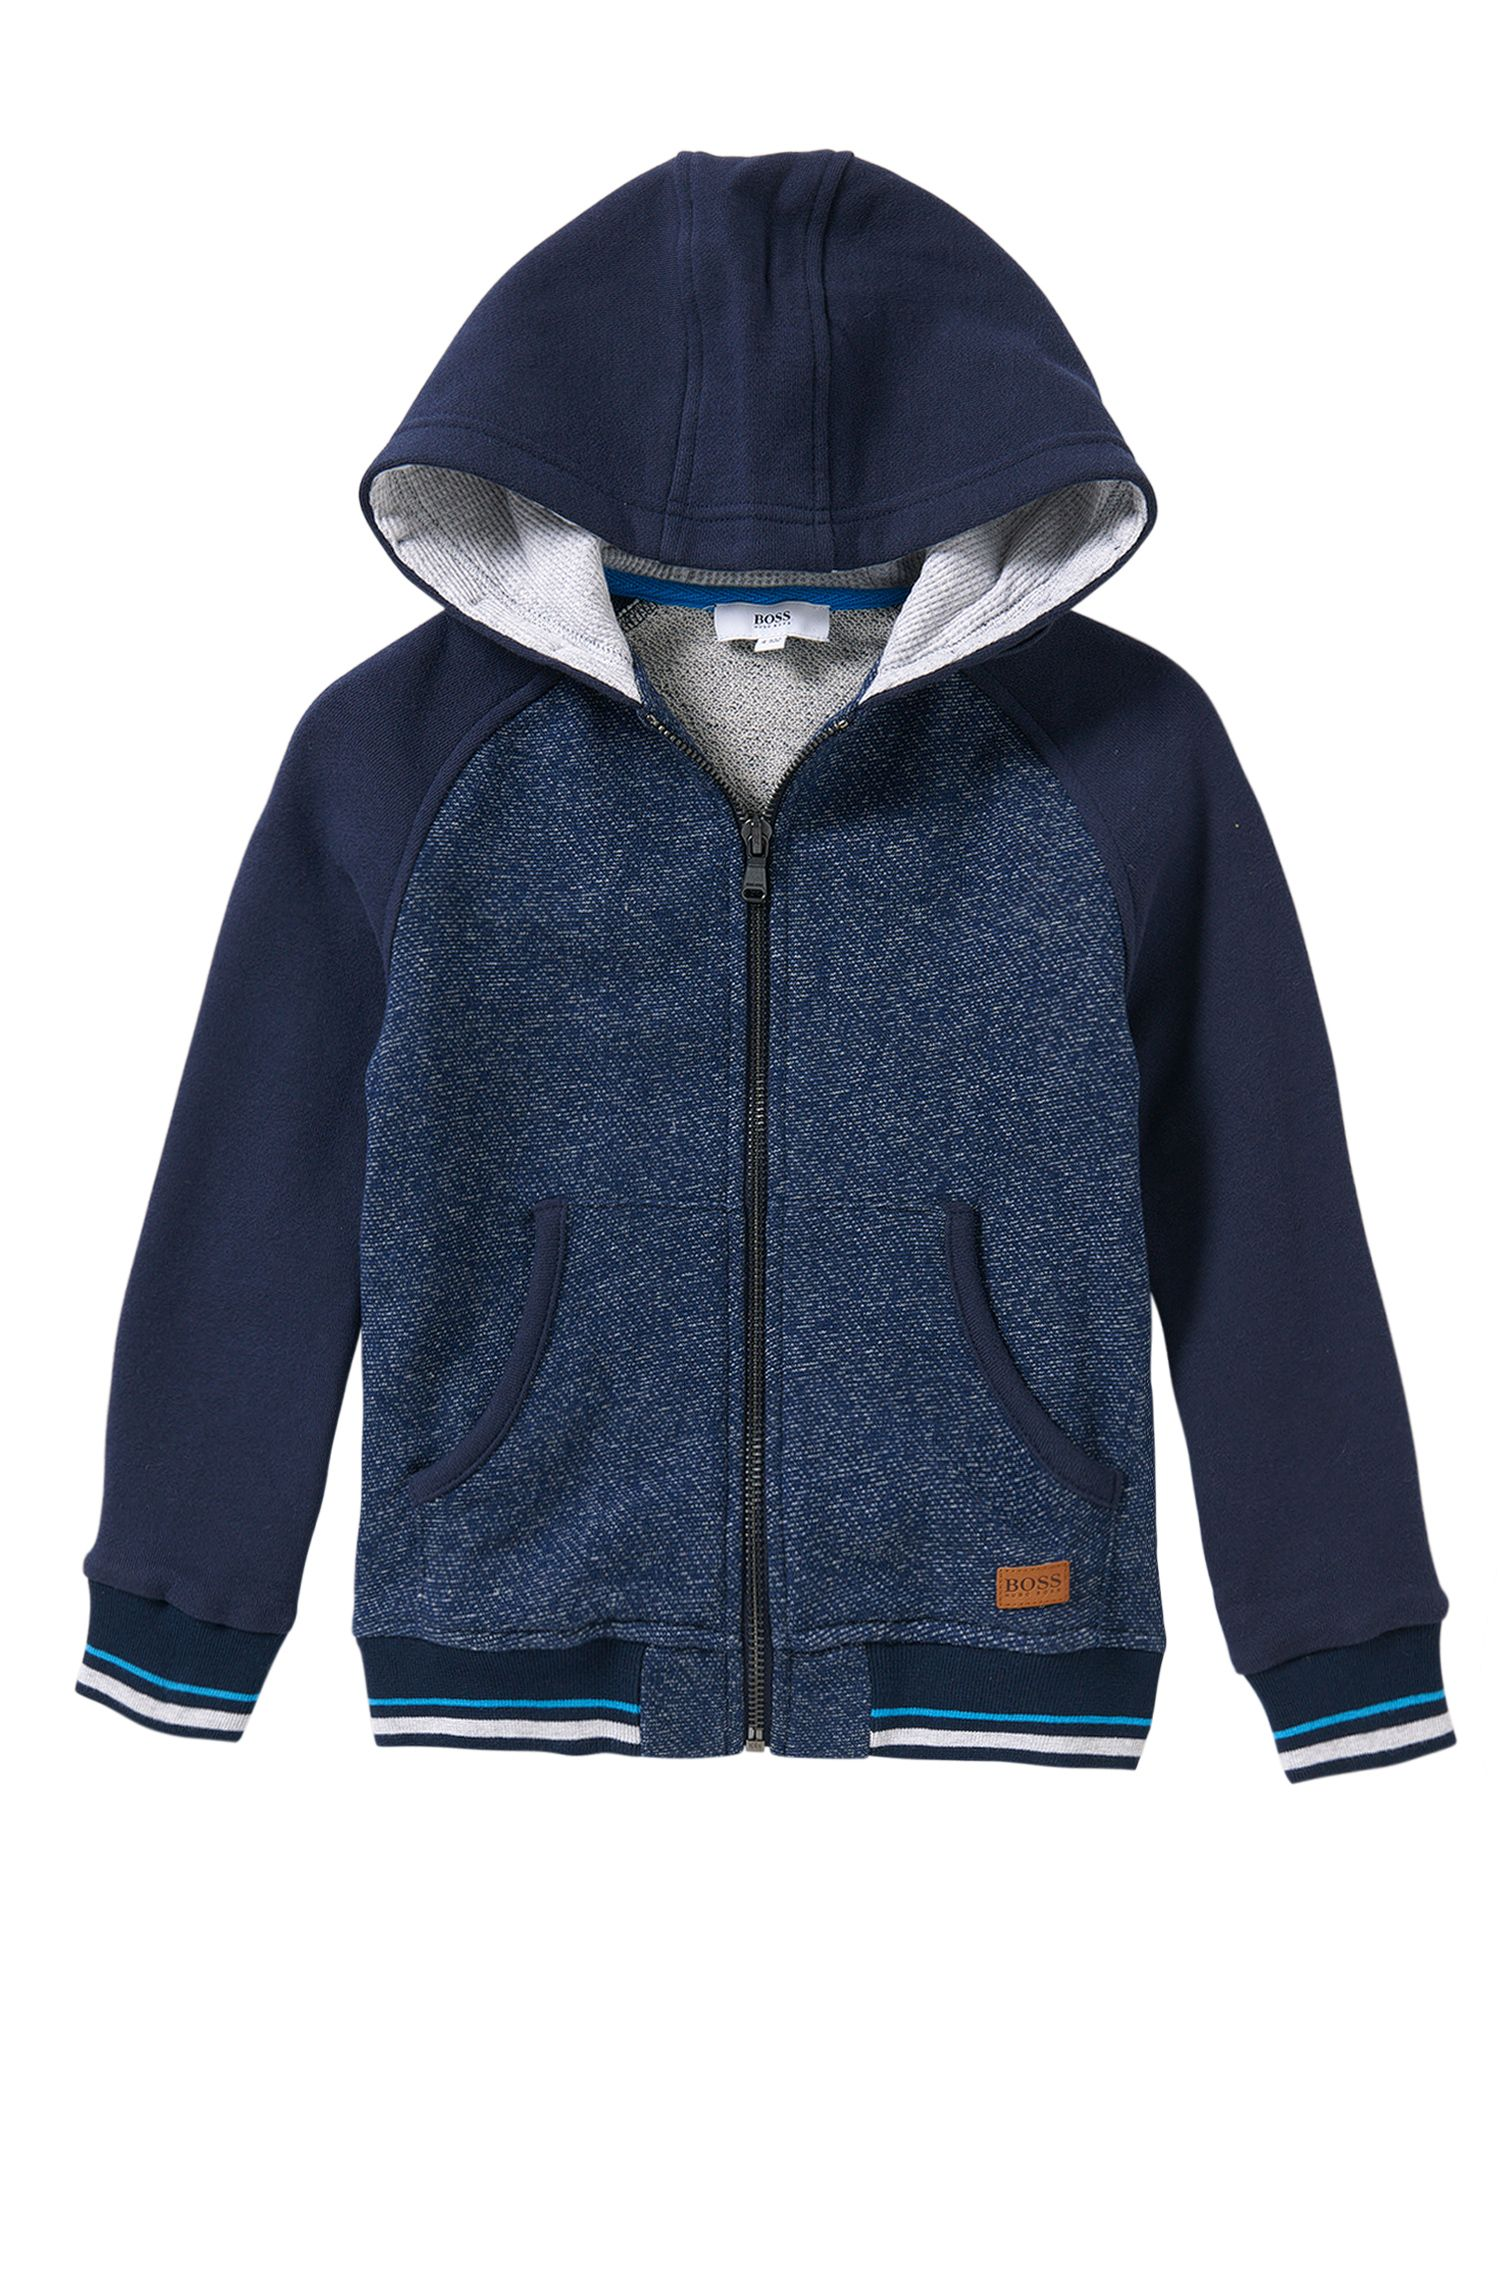 Kids' hooded sweatshirt jacket in cotton with slash pockets: 'J25963'